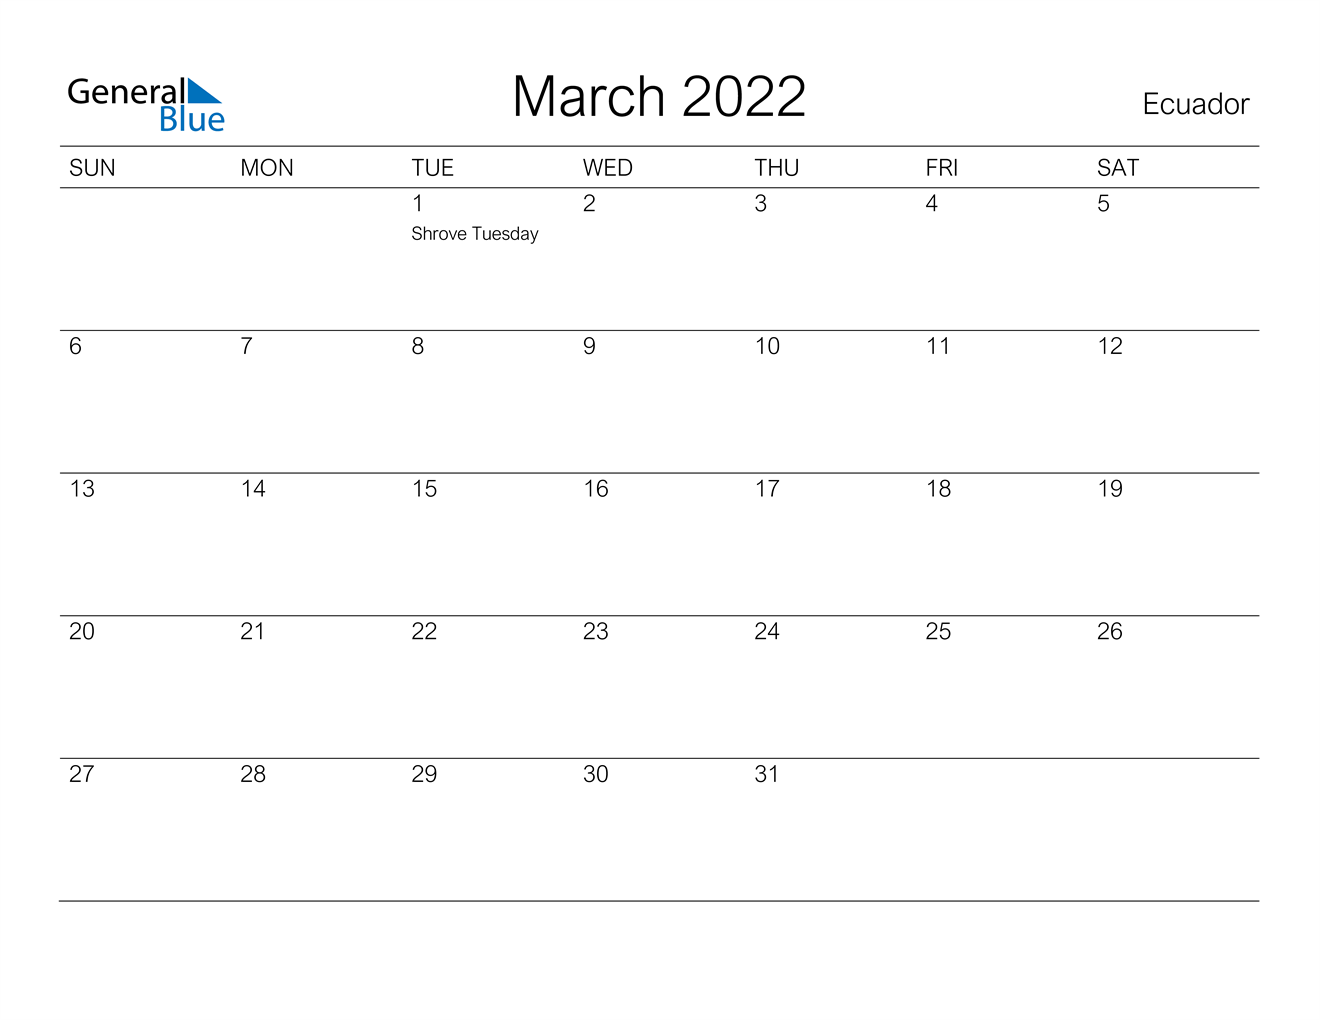 Ecuador March 2022 Calendar With Holidays Regarding 2022 Calendar Feb March April